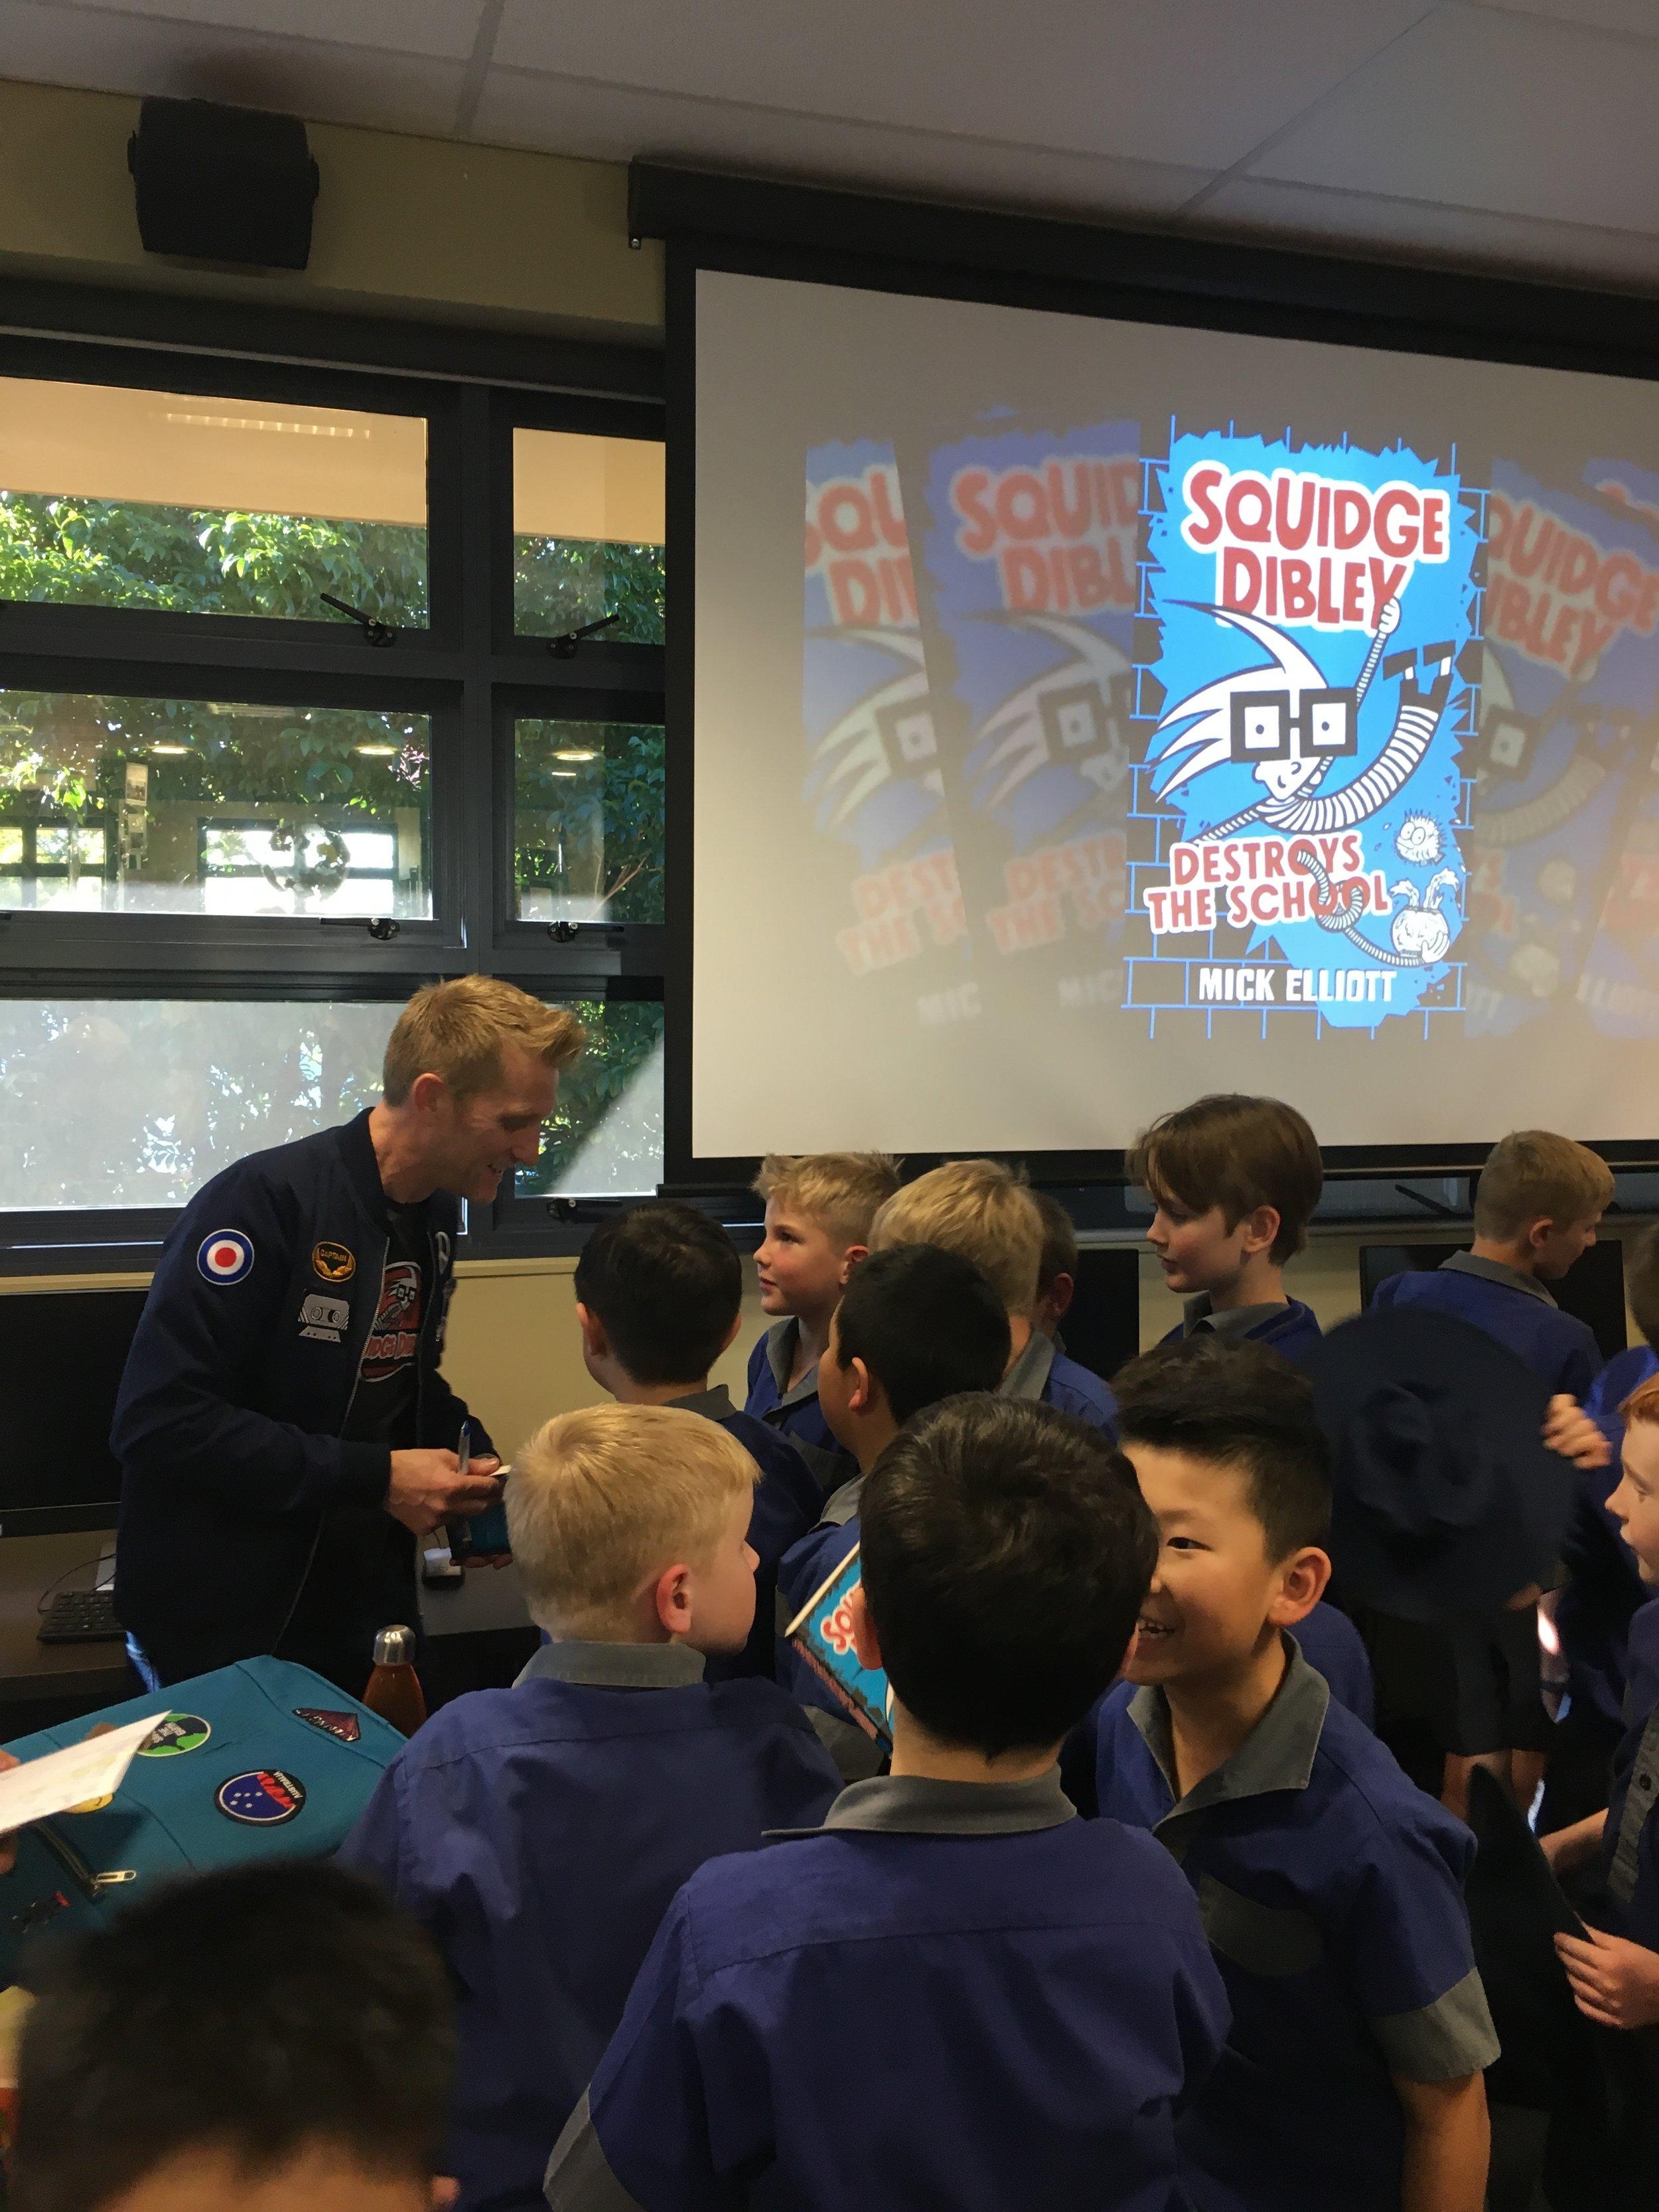 Meeting SQUIDGE DIBLEY fans during a 2019 school visit.